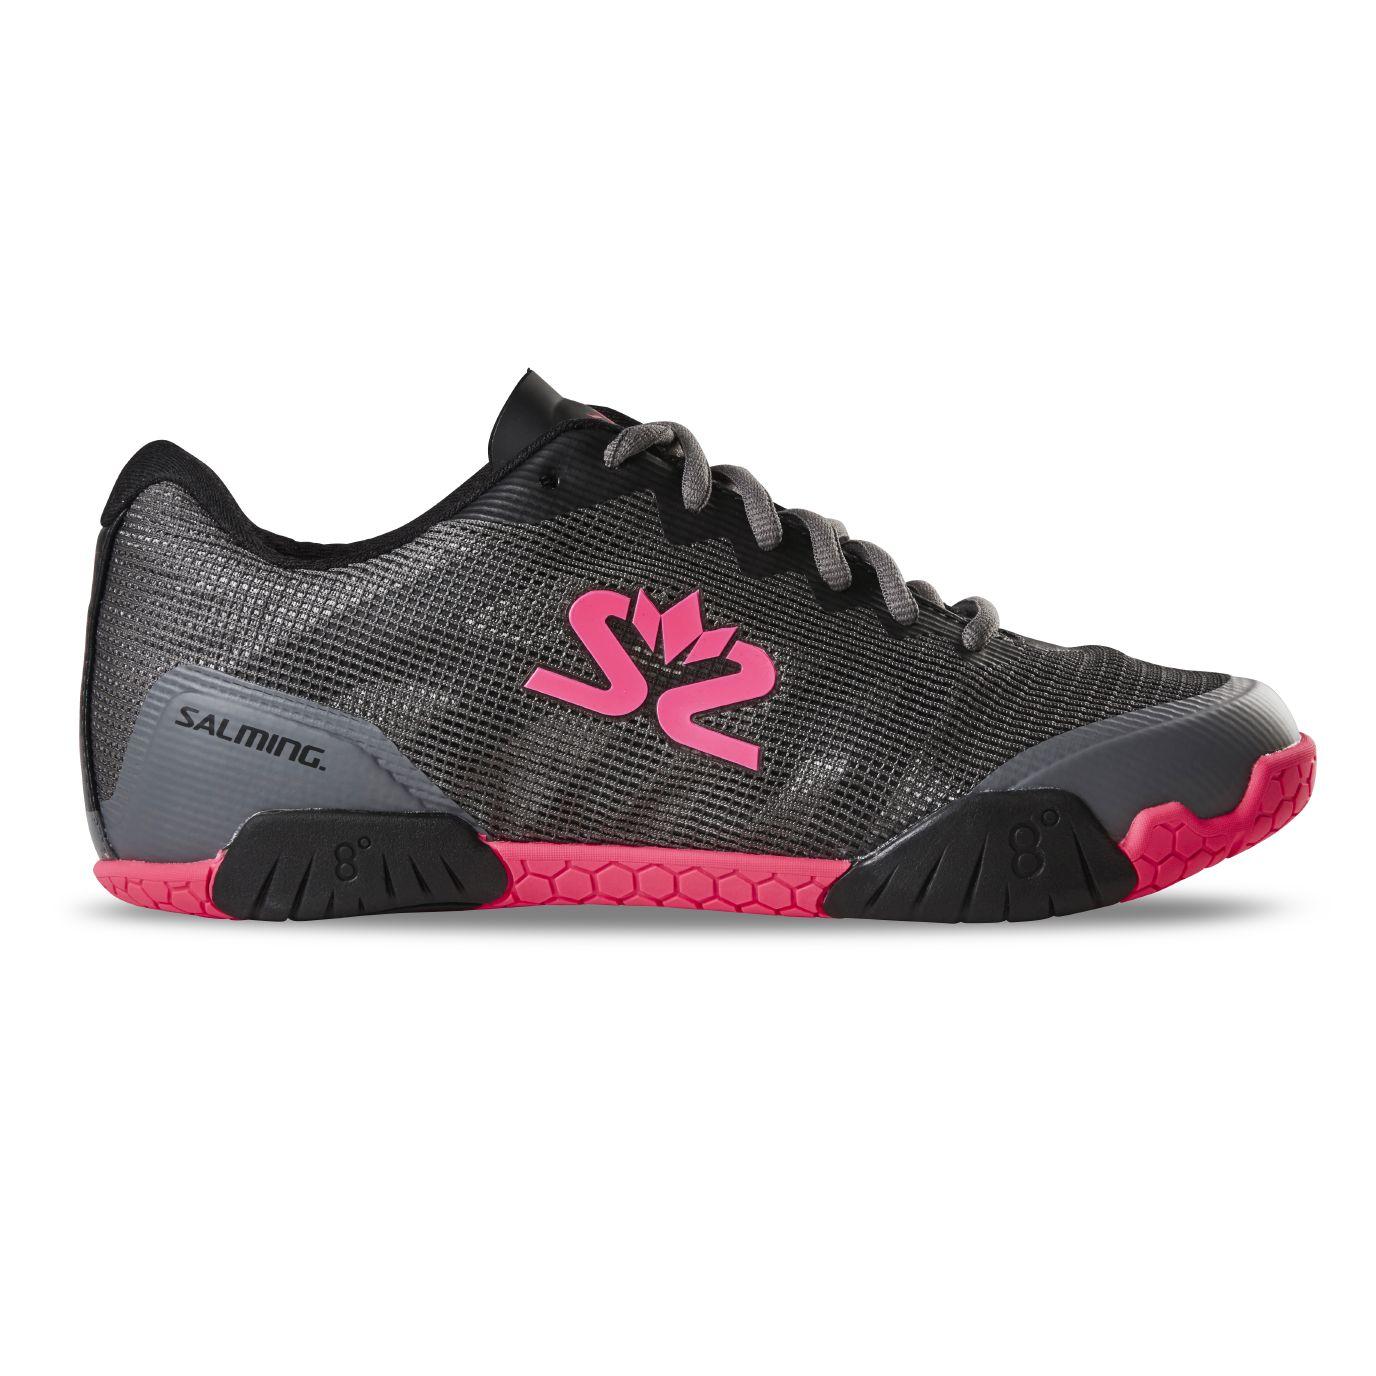 Salming Hawk Shoe Women GunMetal/Pink 5 UK - 38 EUR - 24 cm